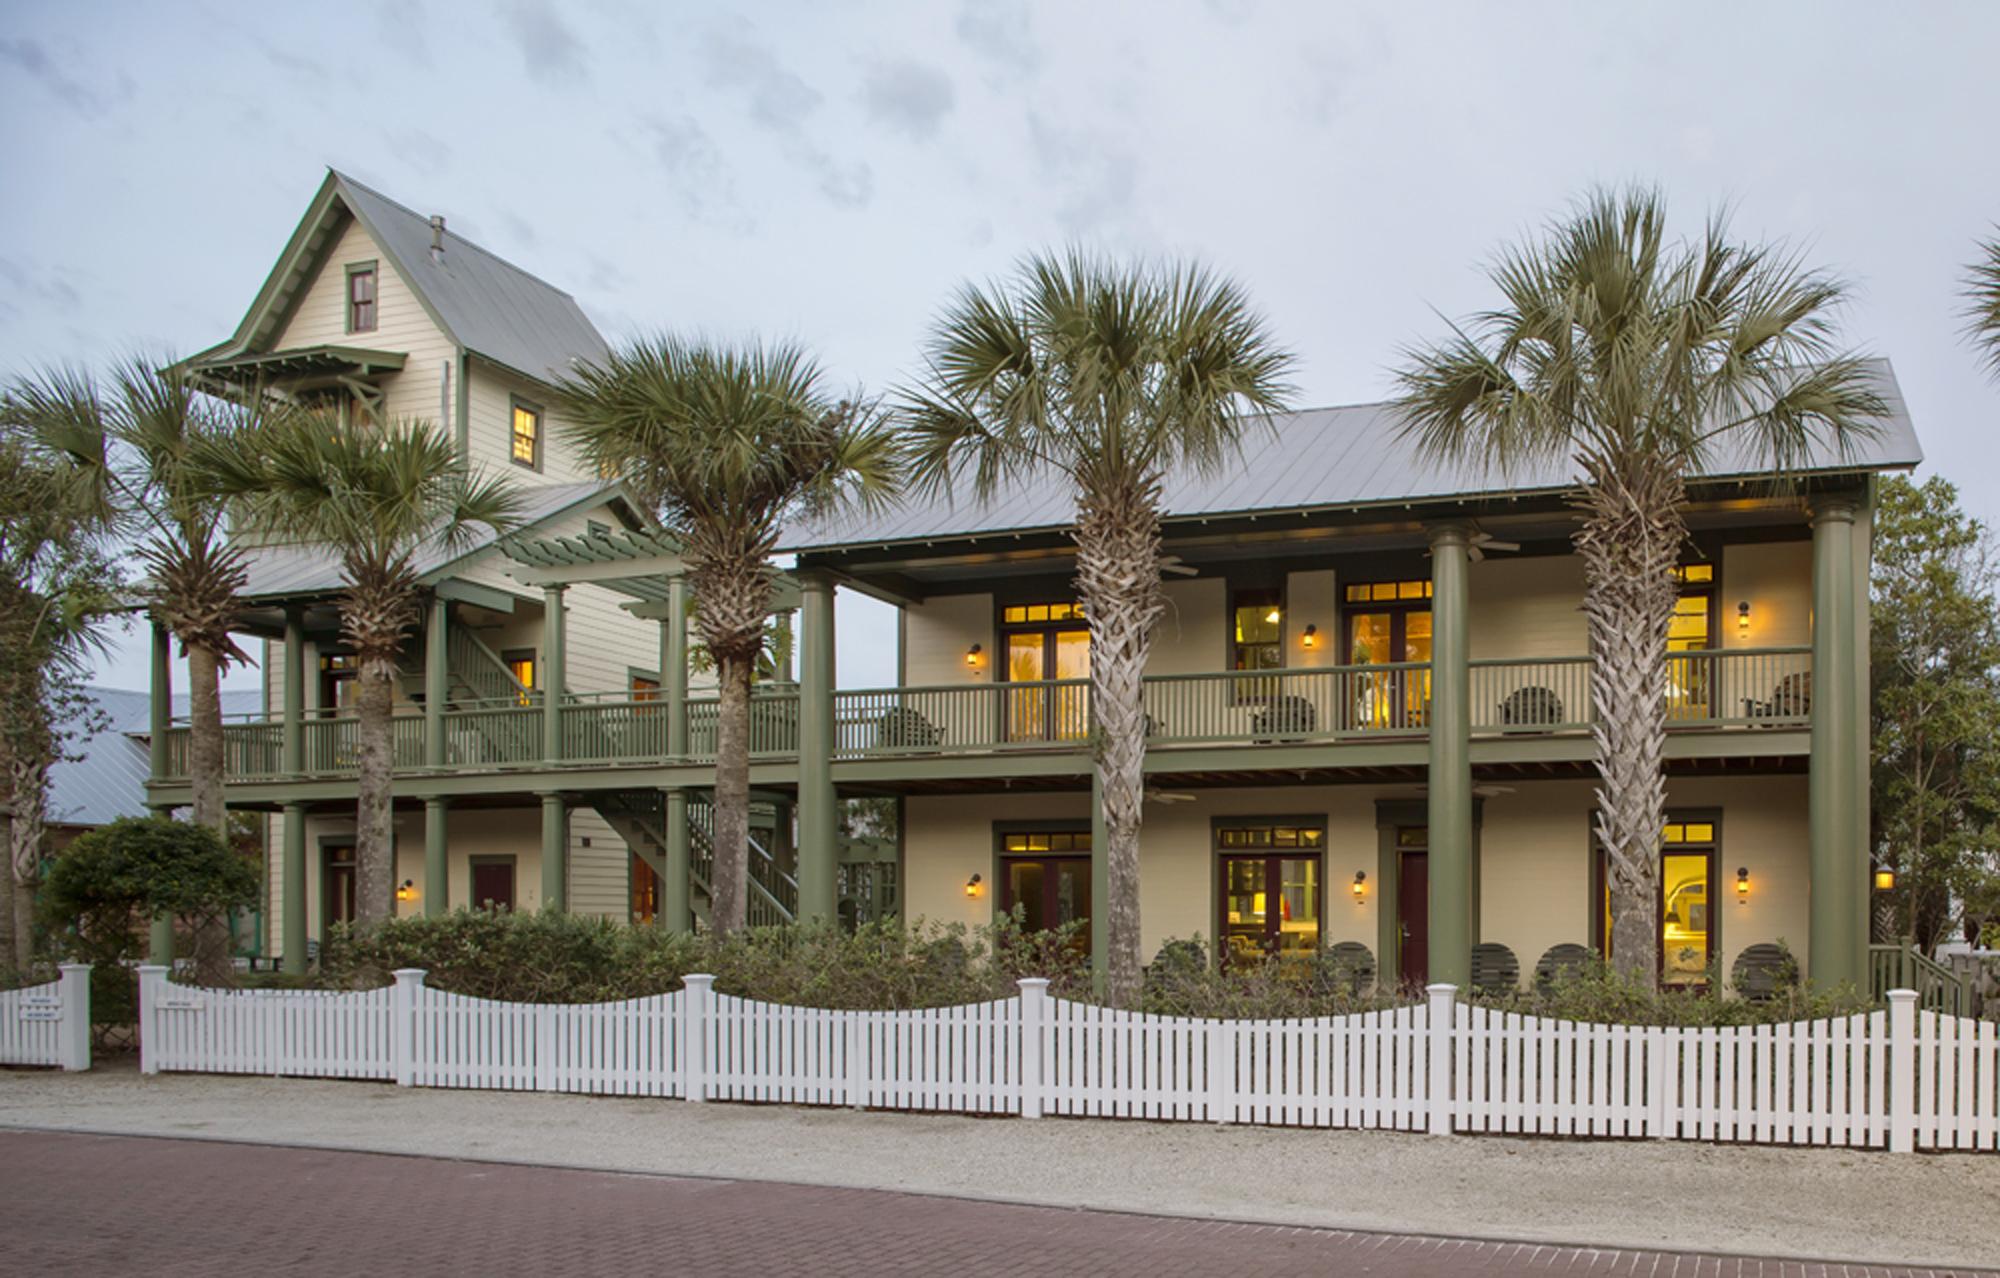 Seaside_Florida.Beach.Natchez_House.New_Urbanism.CNU.Courtyard.Walkable.Robert_Orr_&_Associates.Architecture.Landscape_Architecture.Urbanism.Natchez_Street_View.jpg